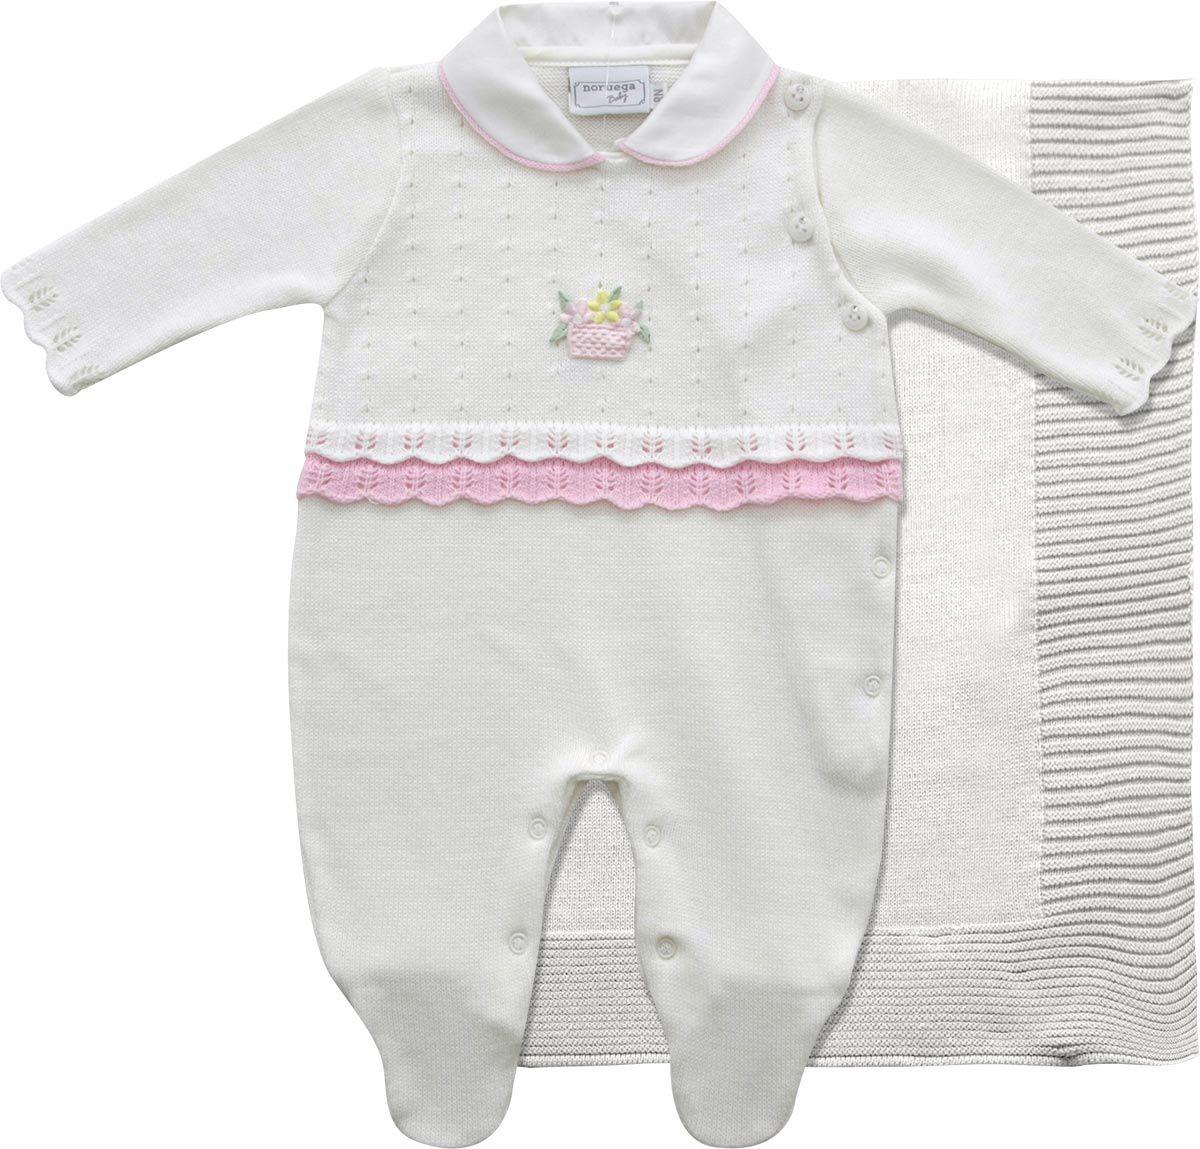 11.564 - Saída Maternidade Patch Cesta